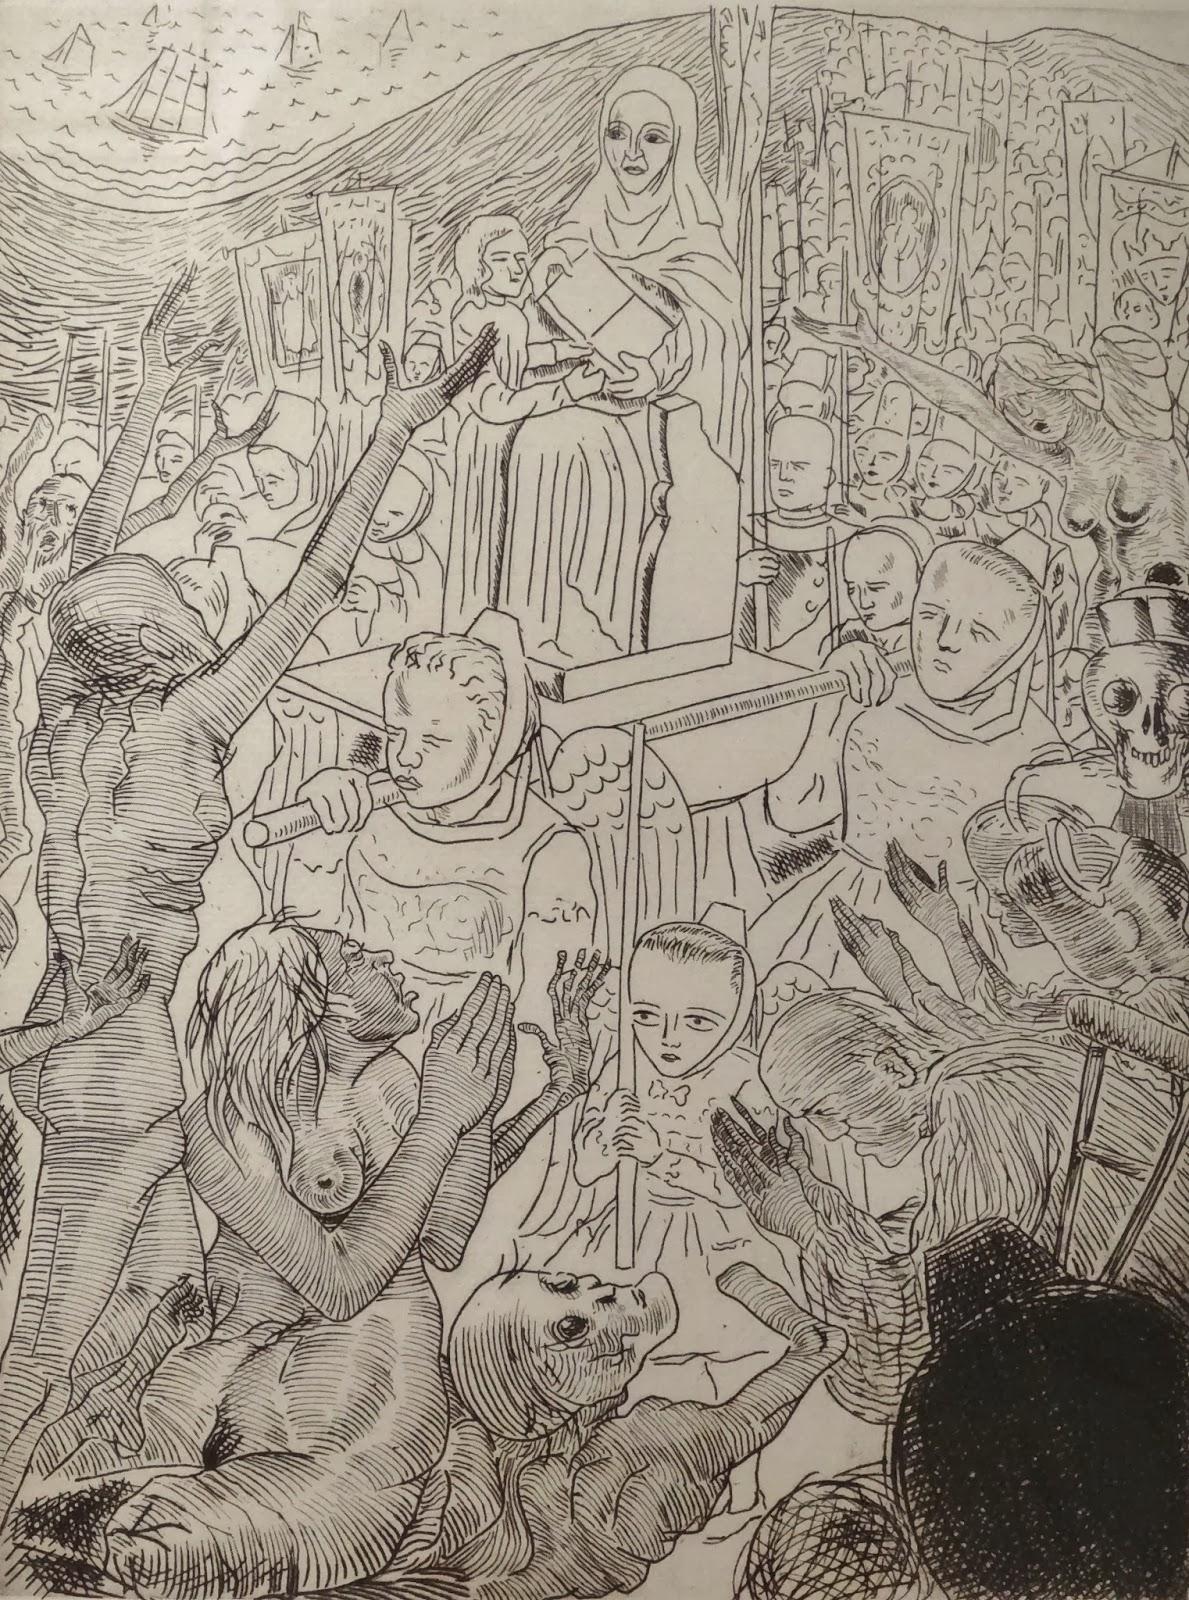 Jean+Moulin+-+la+rapsode+foraine+-+la+procession+-+illustration+de+Armor+de+Tristan+Corbi%25C3%25A8re.JPG